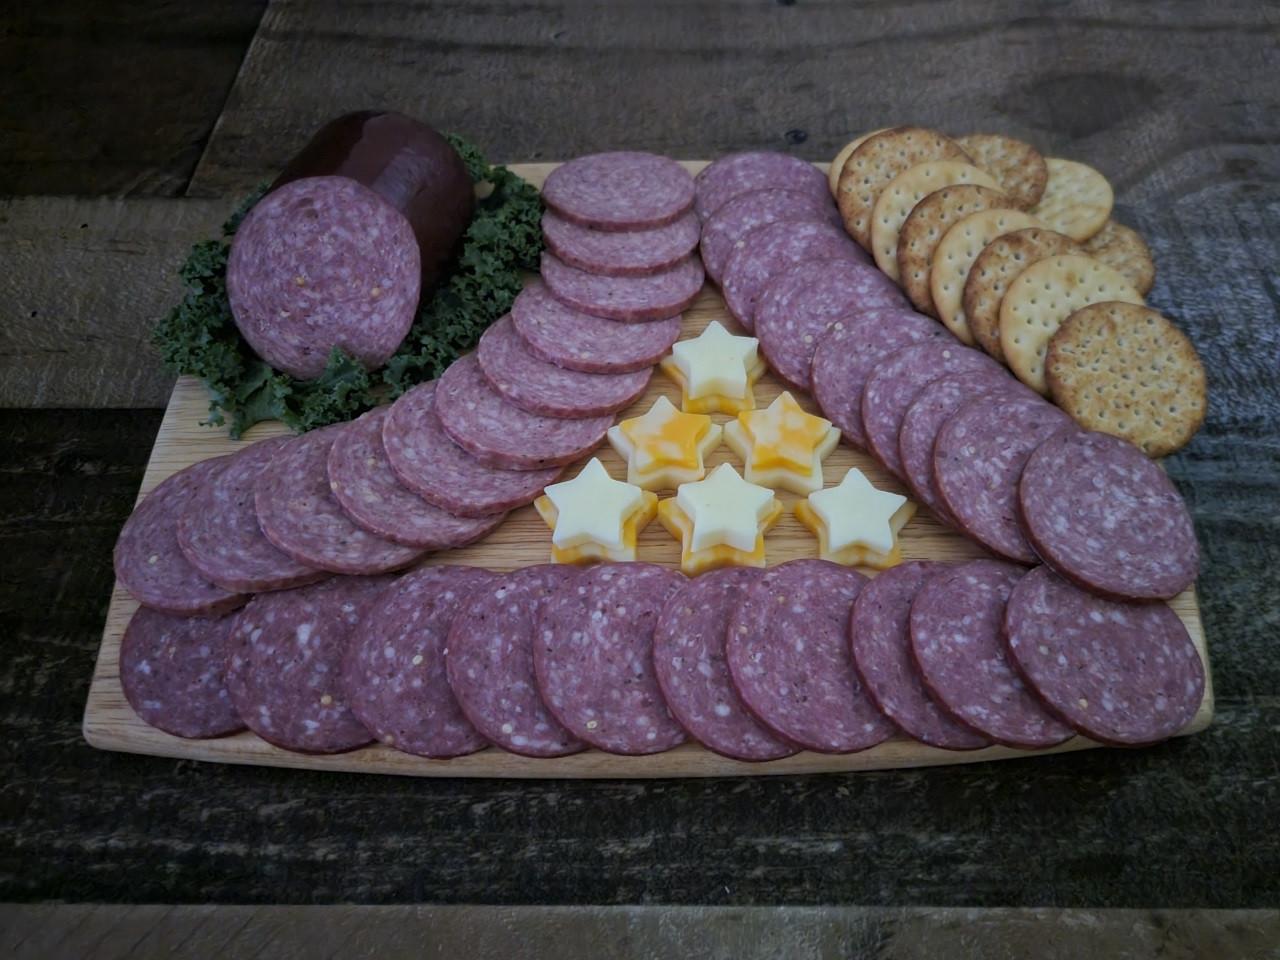 Silver Creek Buffalo Summer Sausage with pork & beef 8 oz.